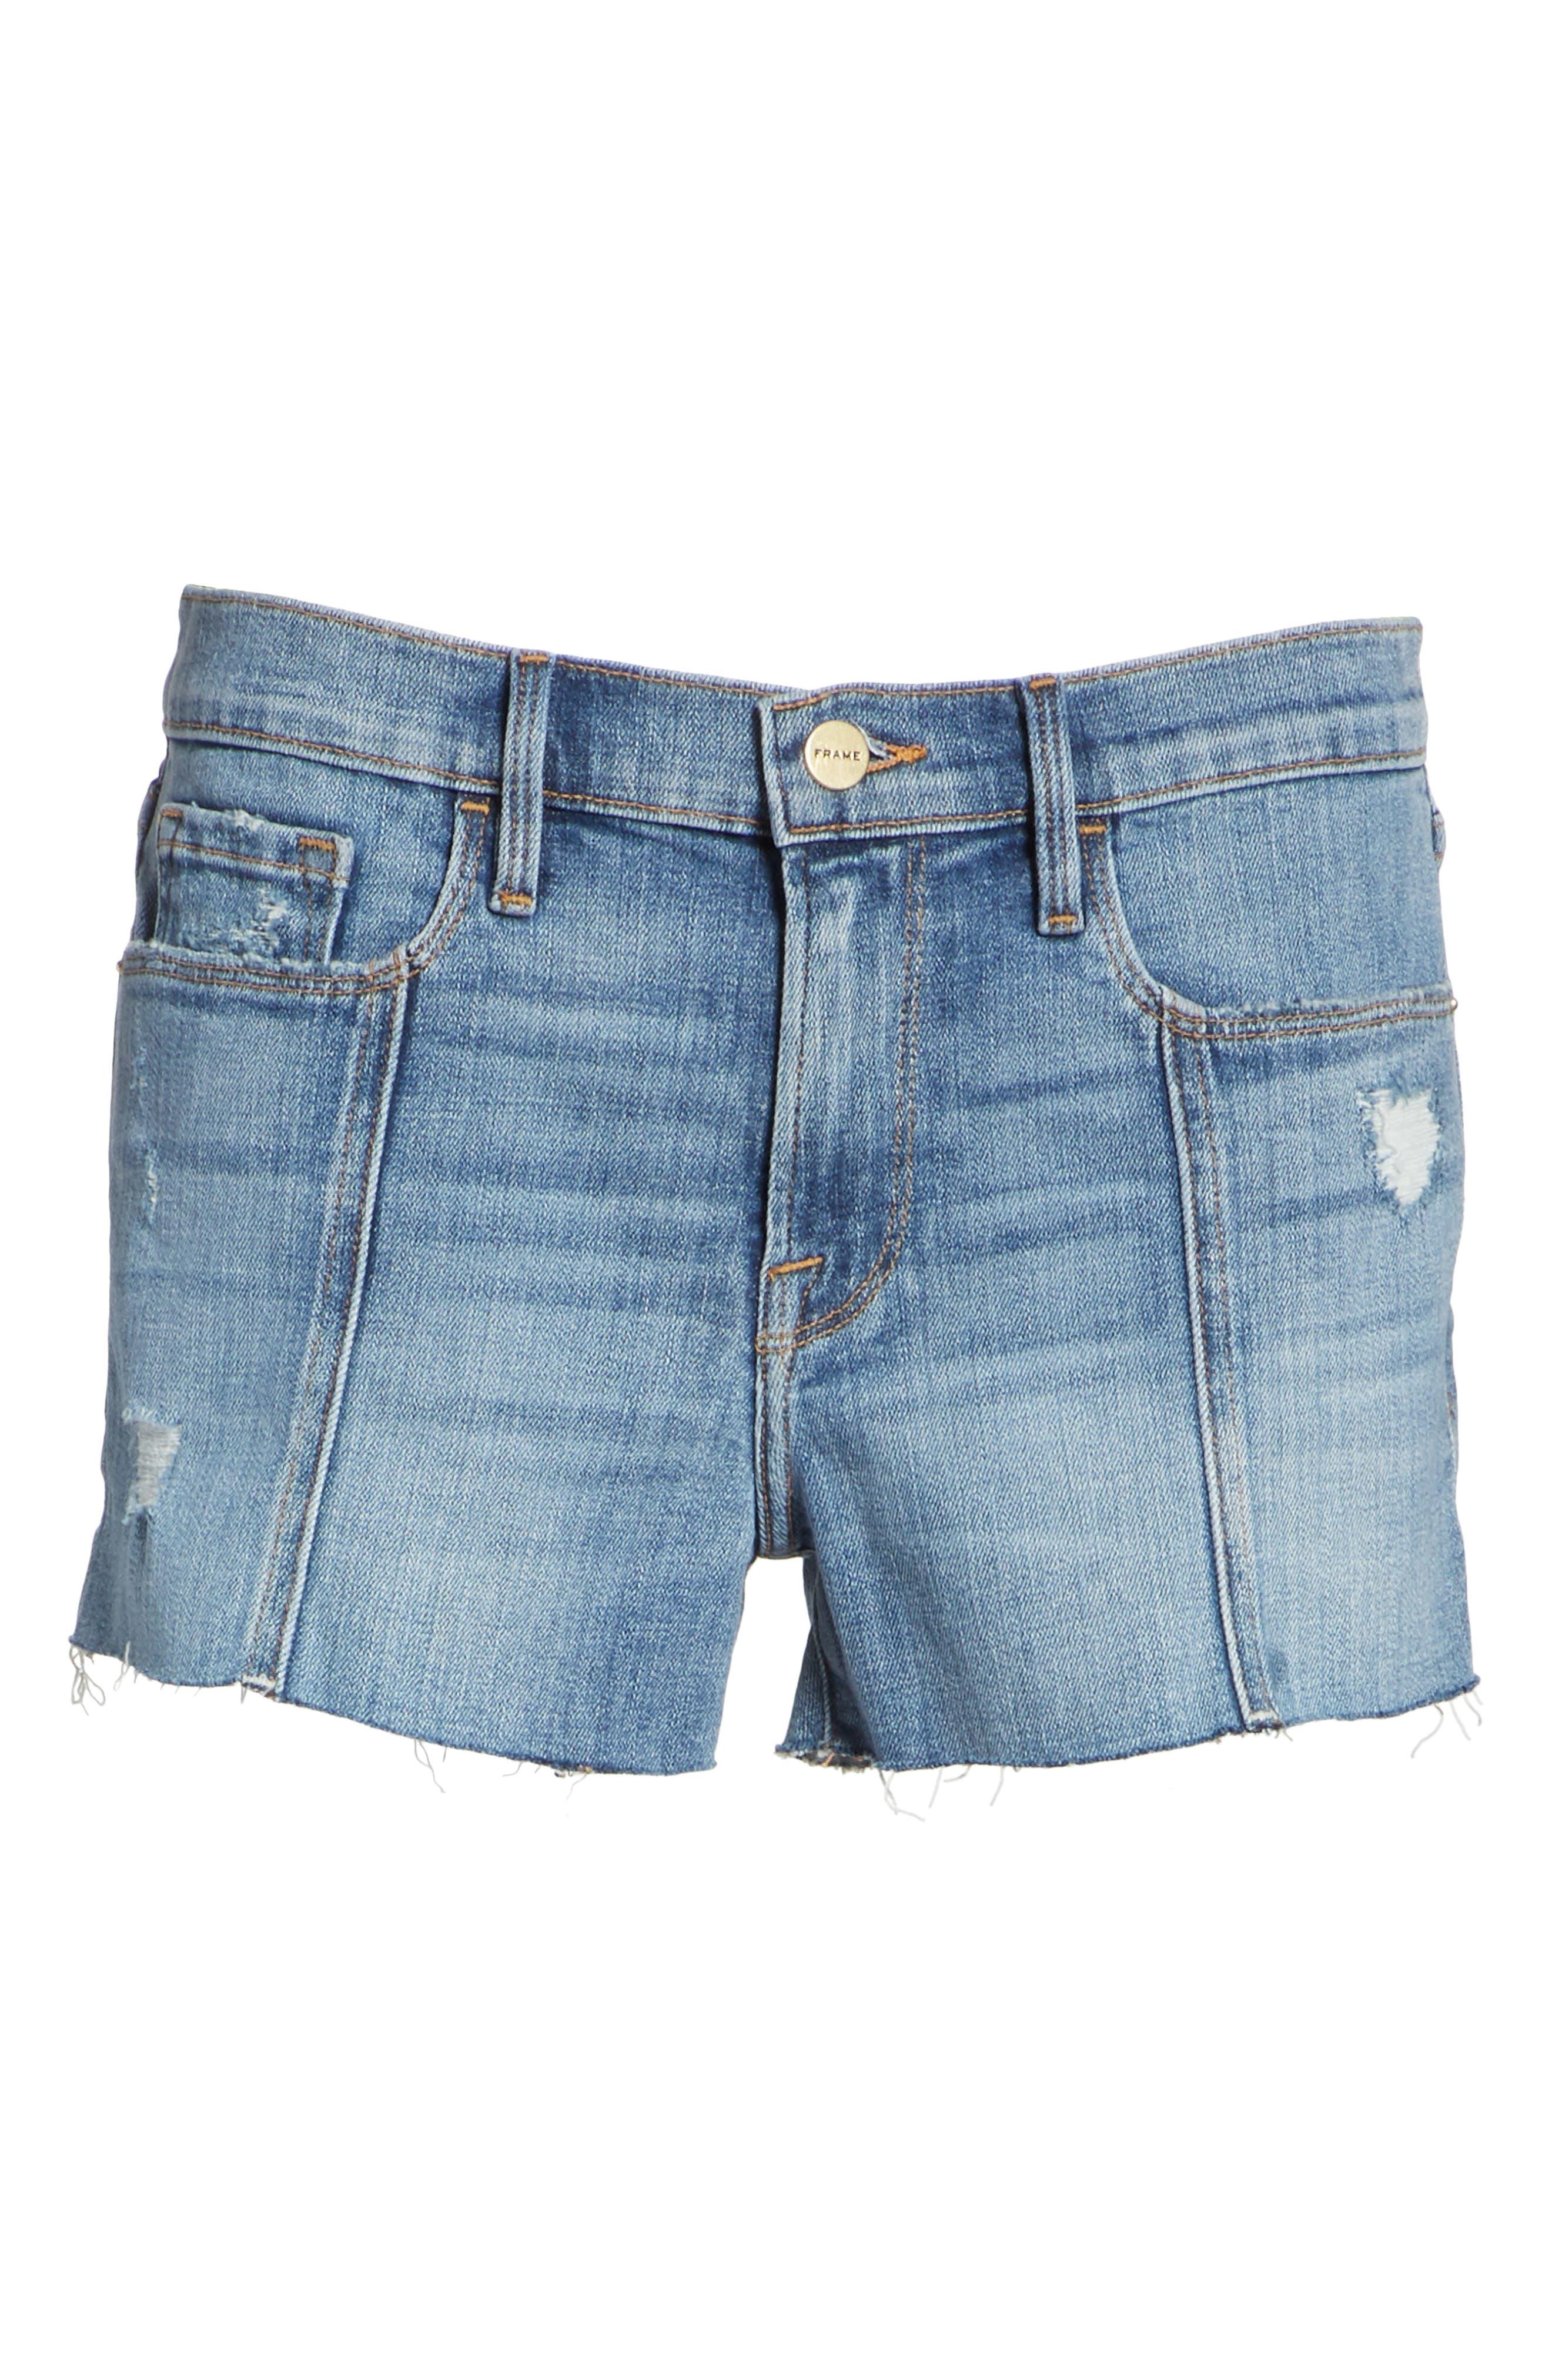 Le Cutoff Center Seam Denim Shorts,                             Alternate thumbnail 6, color,                             Sandpiper